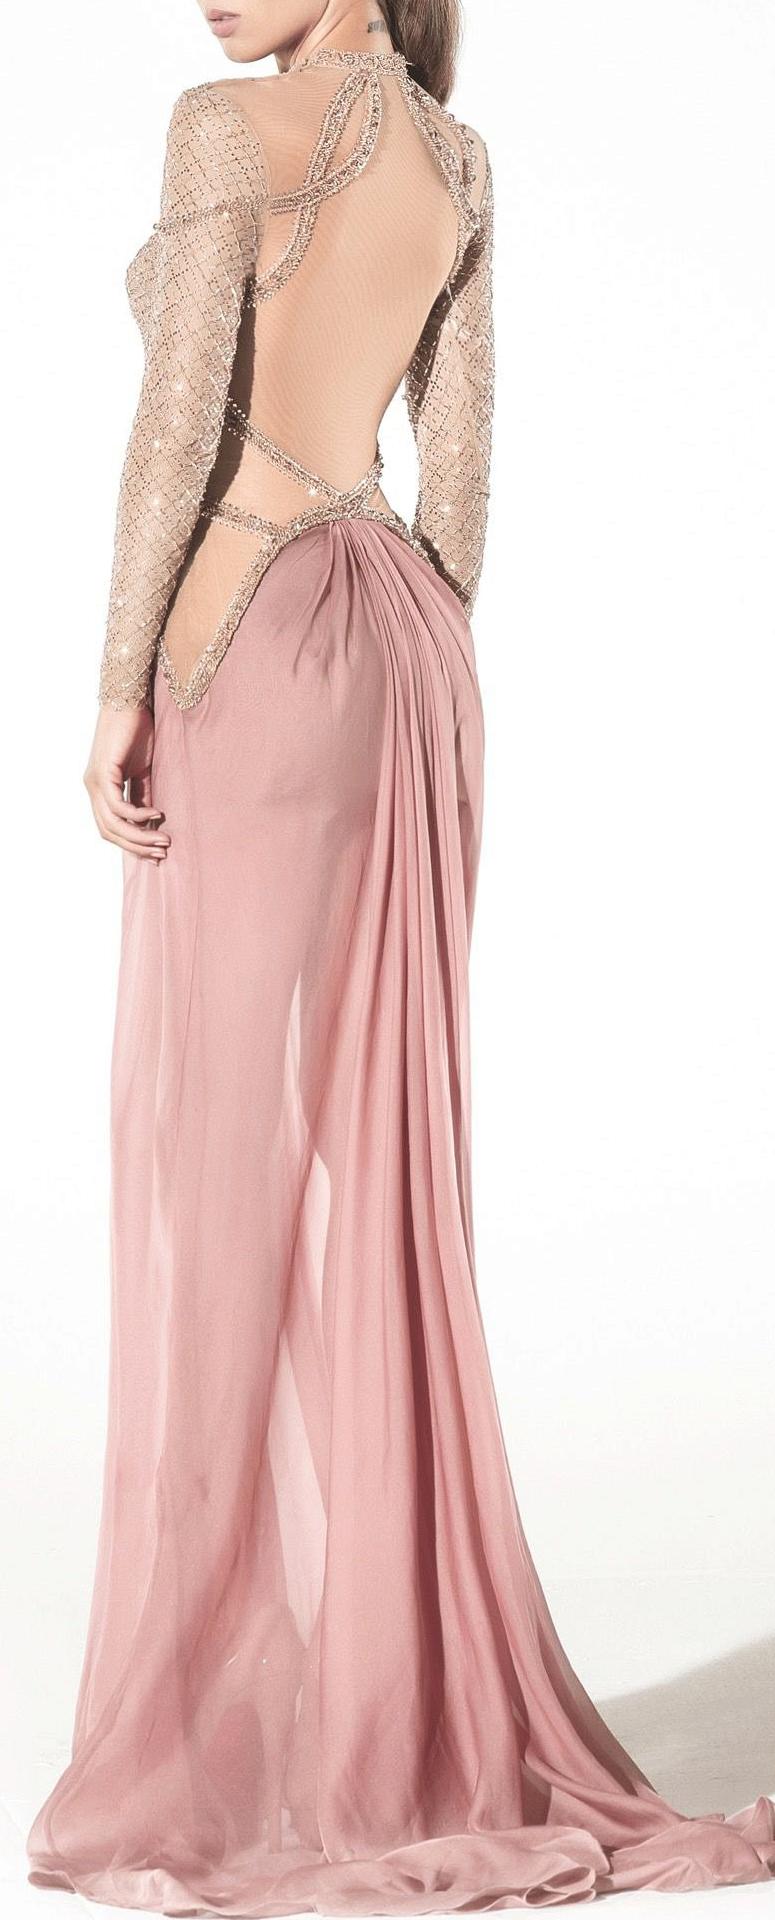 Charbel Zoe - Spring Summer 2016 #Couture   MODA   Pinterest ...